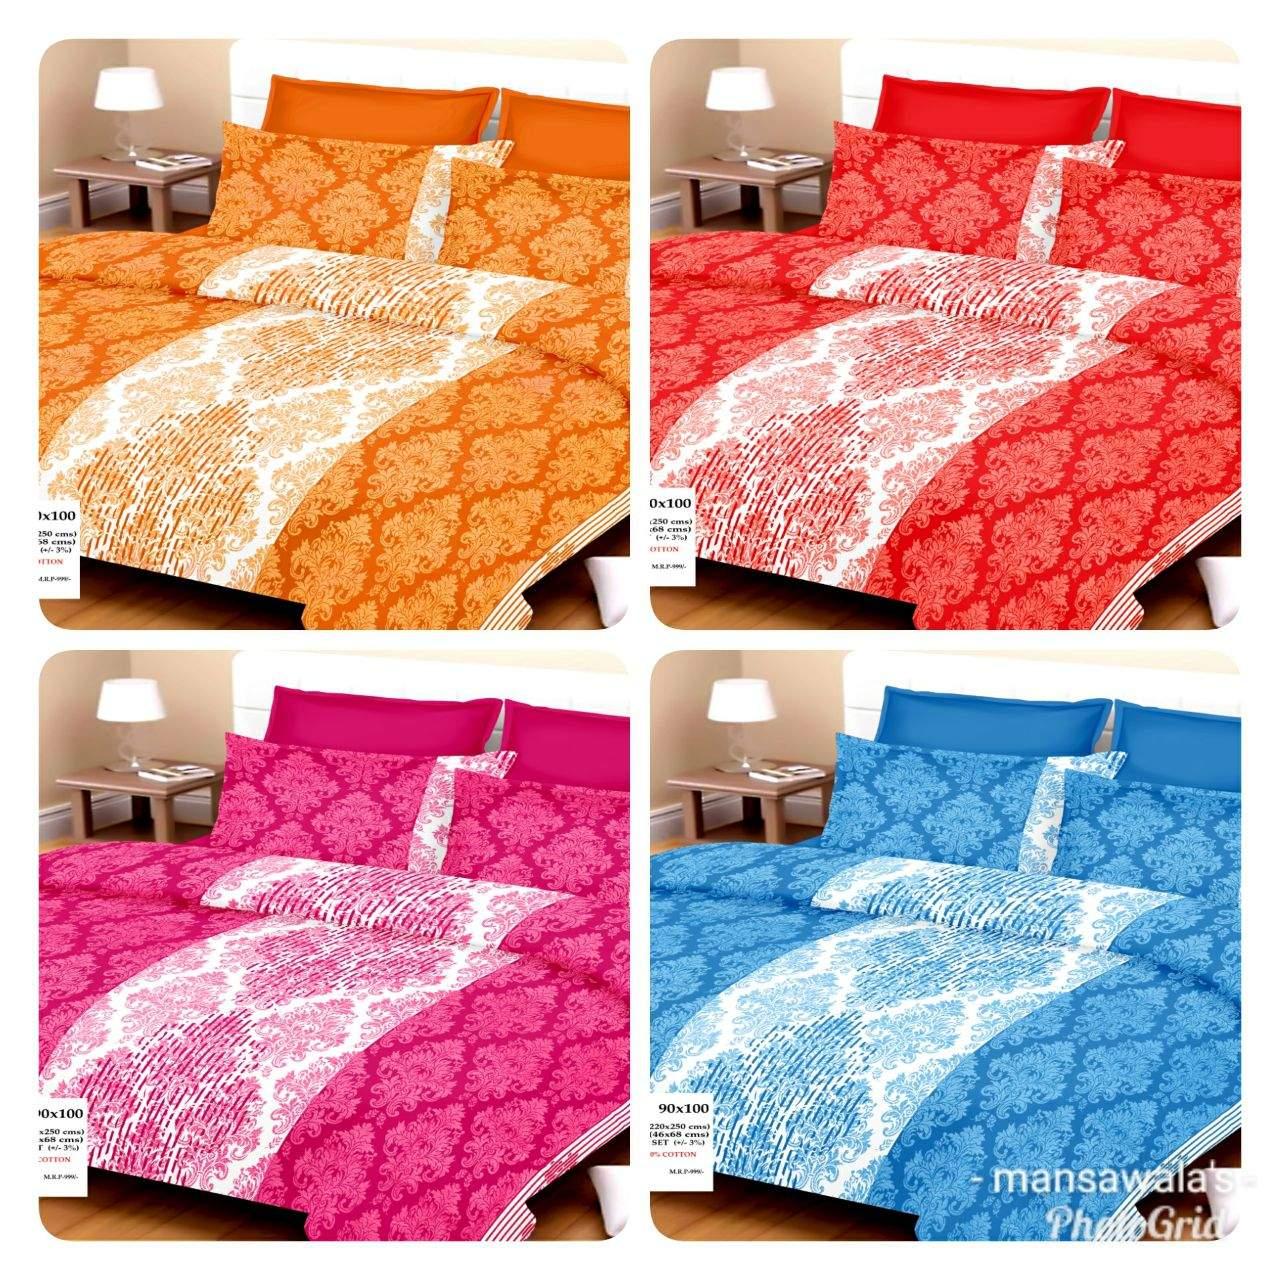 b913c132ca Top 3d Print Bed Sheet Manufacturers in Ahmedabad - Best 3d Bedsheet ...